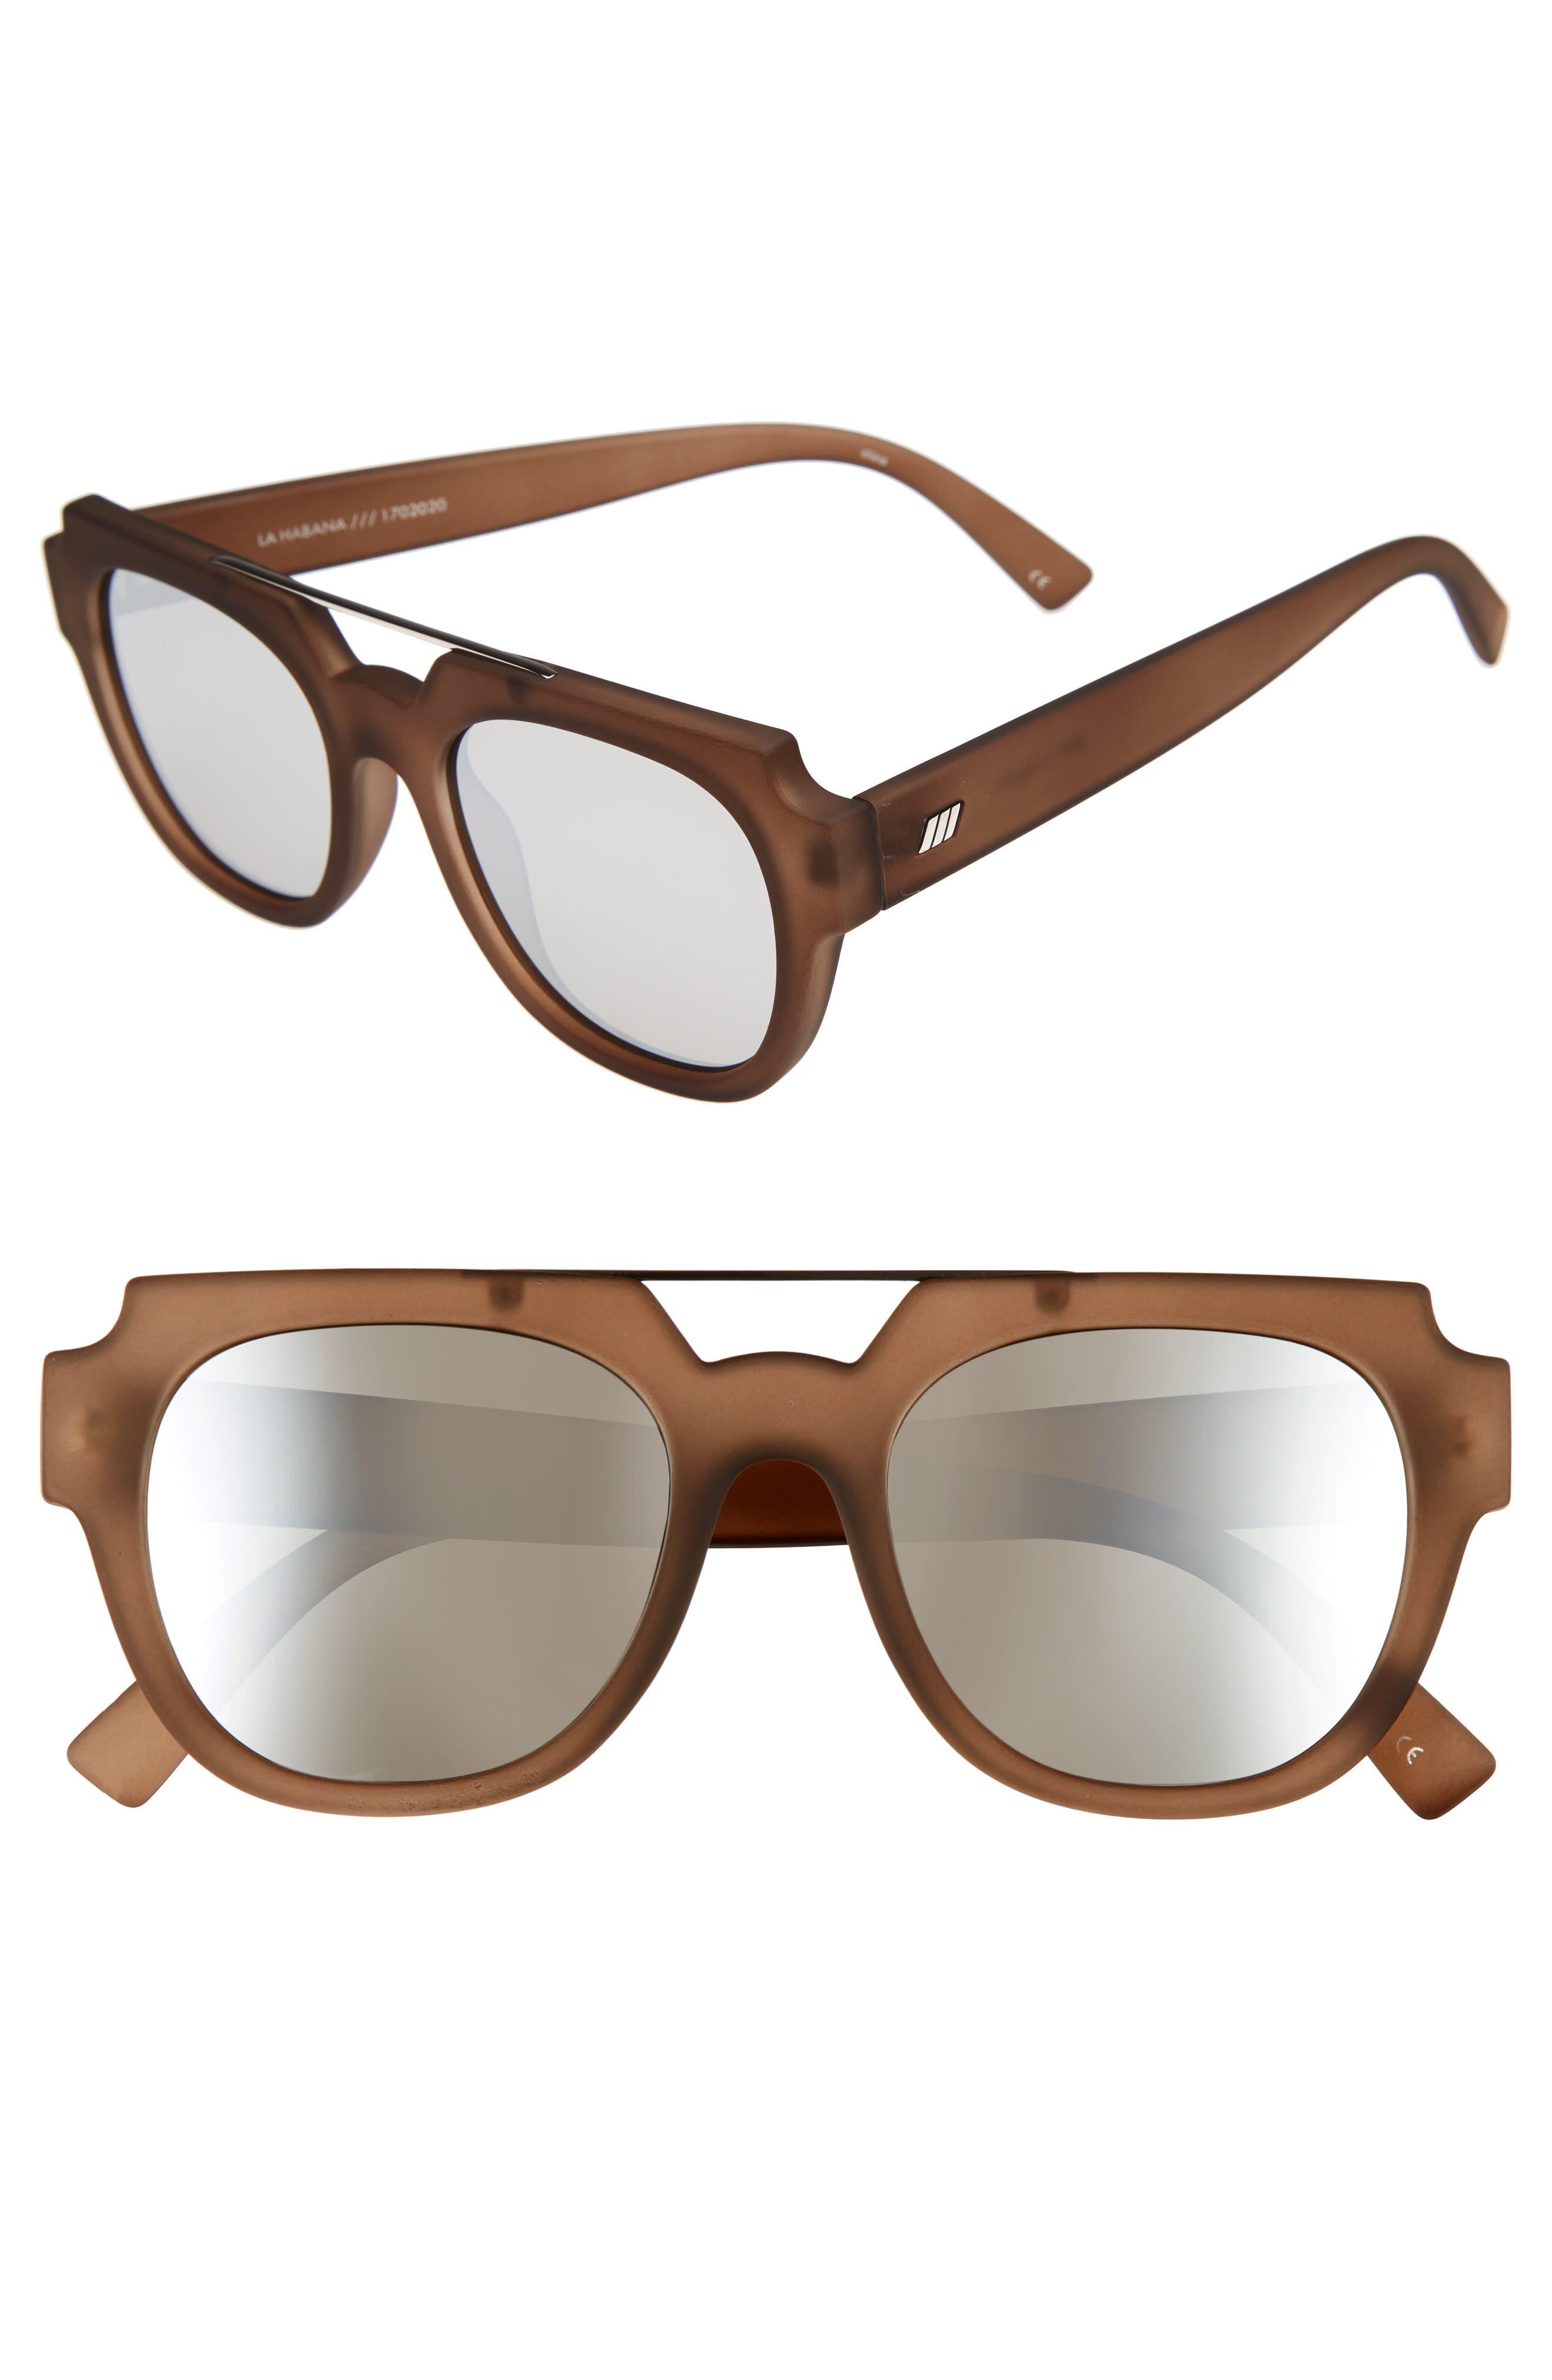 Le Specs La Habana 52mm Retro Sunglasses